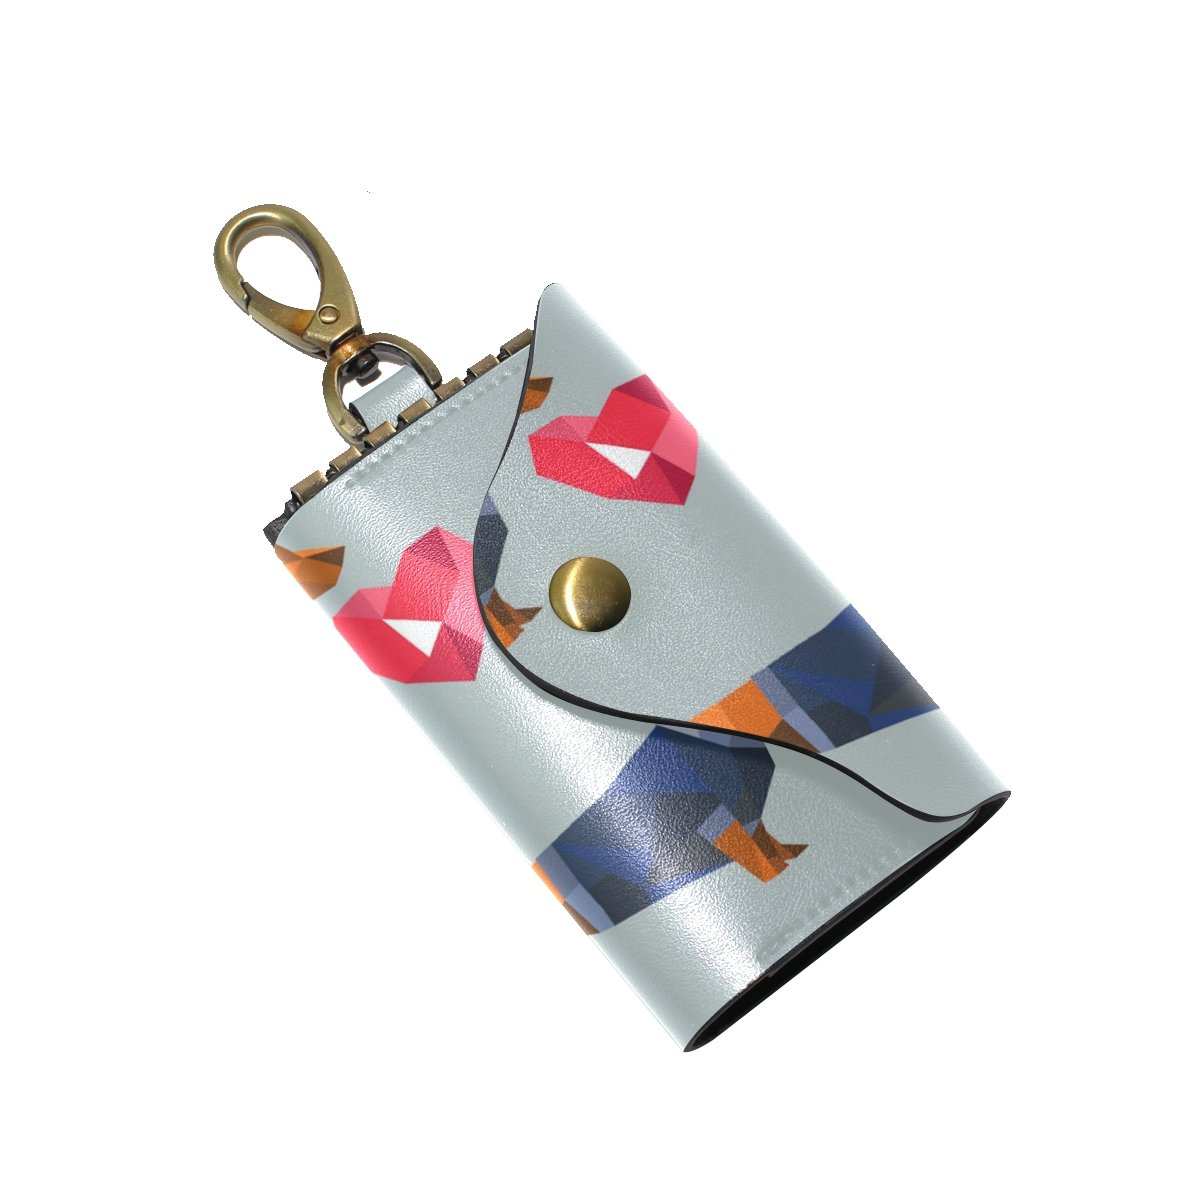 DEYYA Dachshund Dog Polygon Leather Key Case Wallets Unisex Keychain Key Holder with 6 Hooks Snap Closure